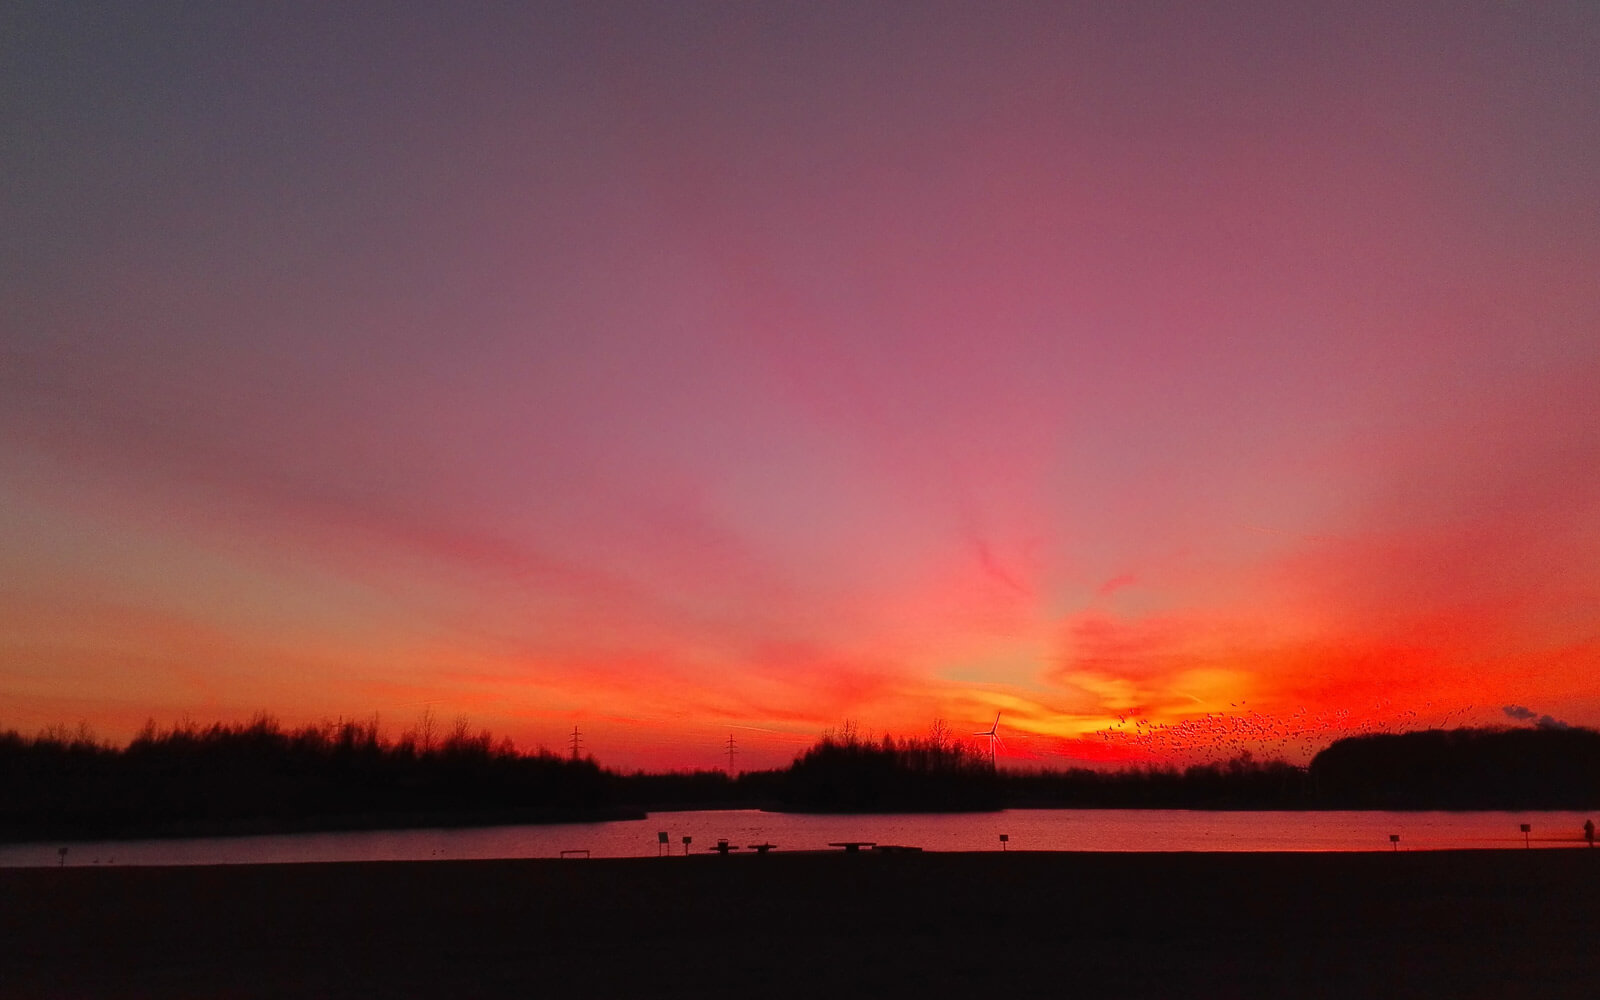 Sonnenuntergang im Seepark Lünen, NRW